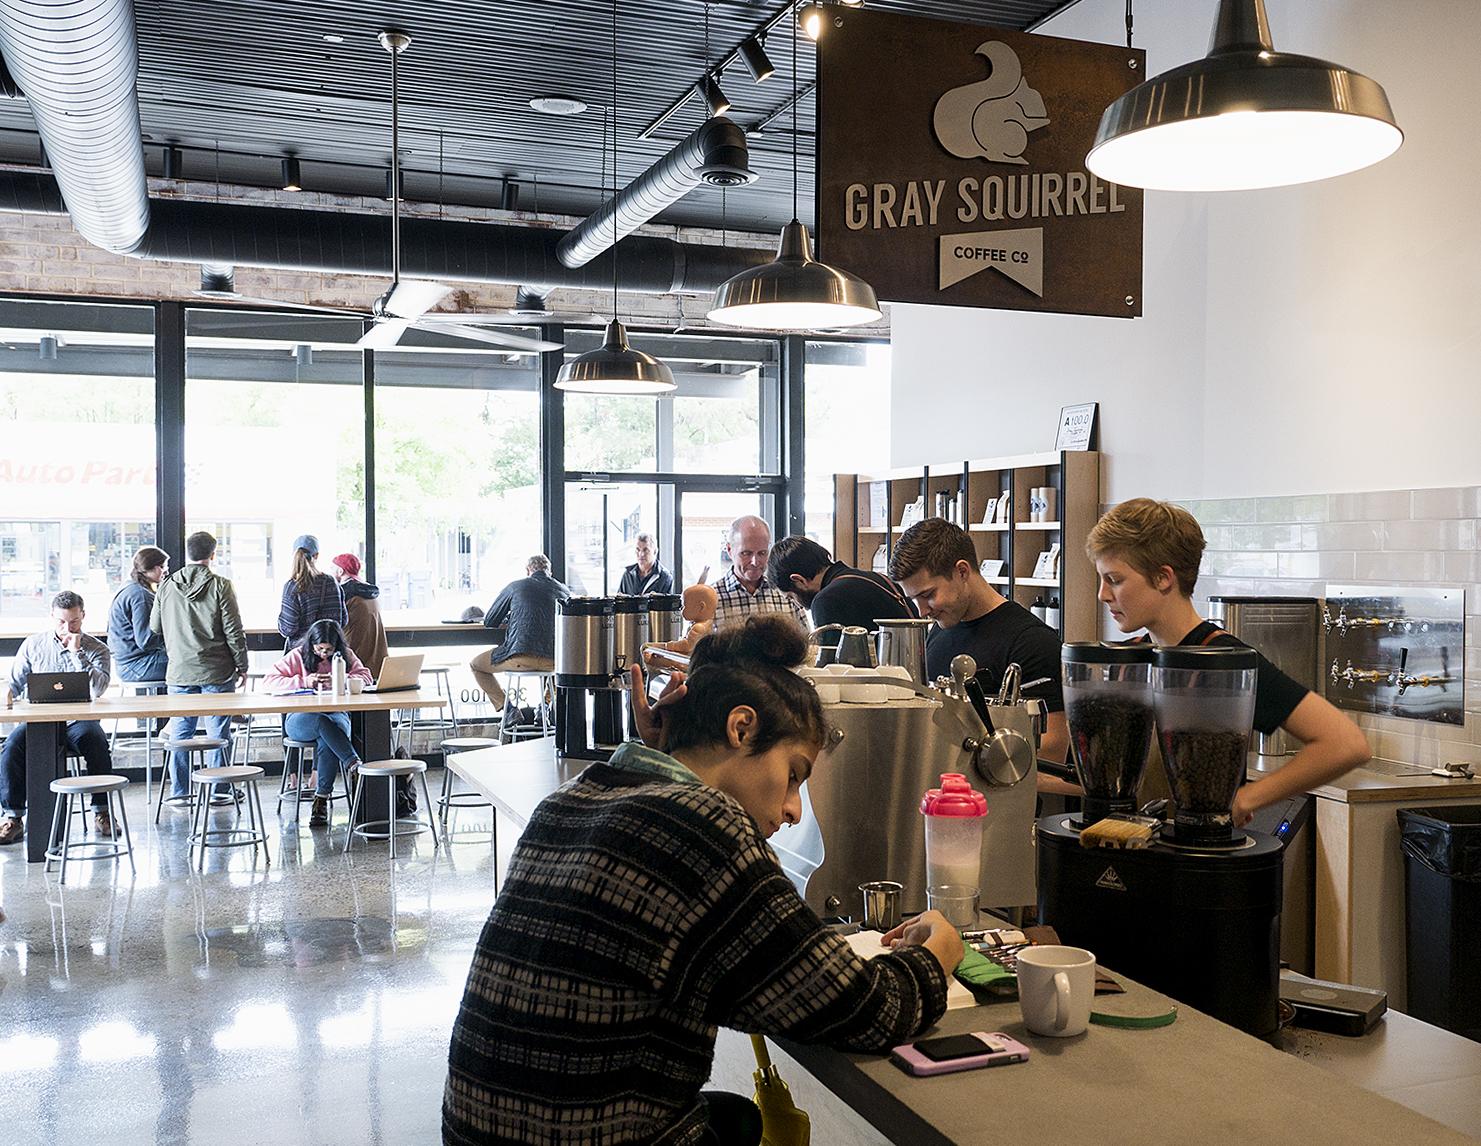 Gray Squirrel Coffee Co